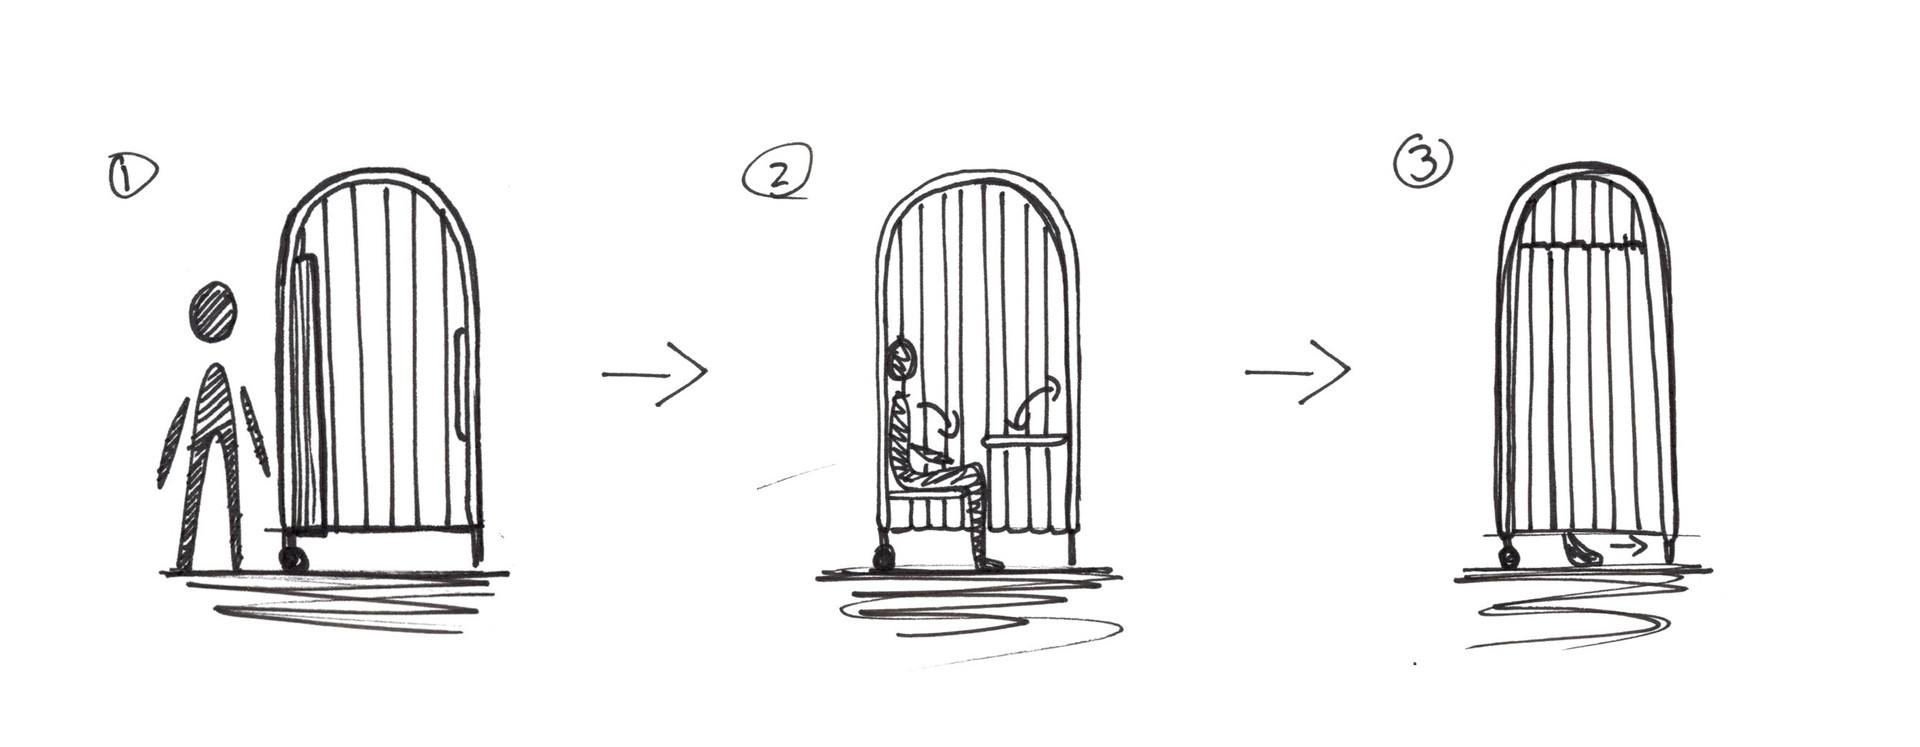 usage sketches.jpg